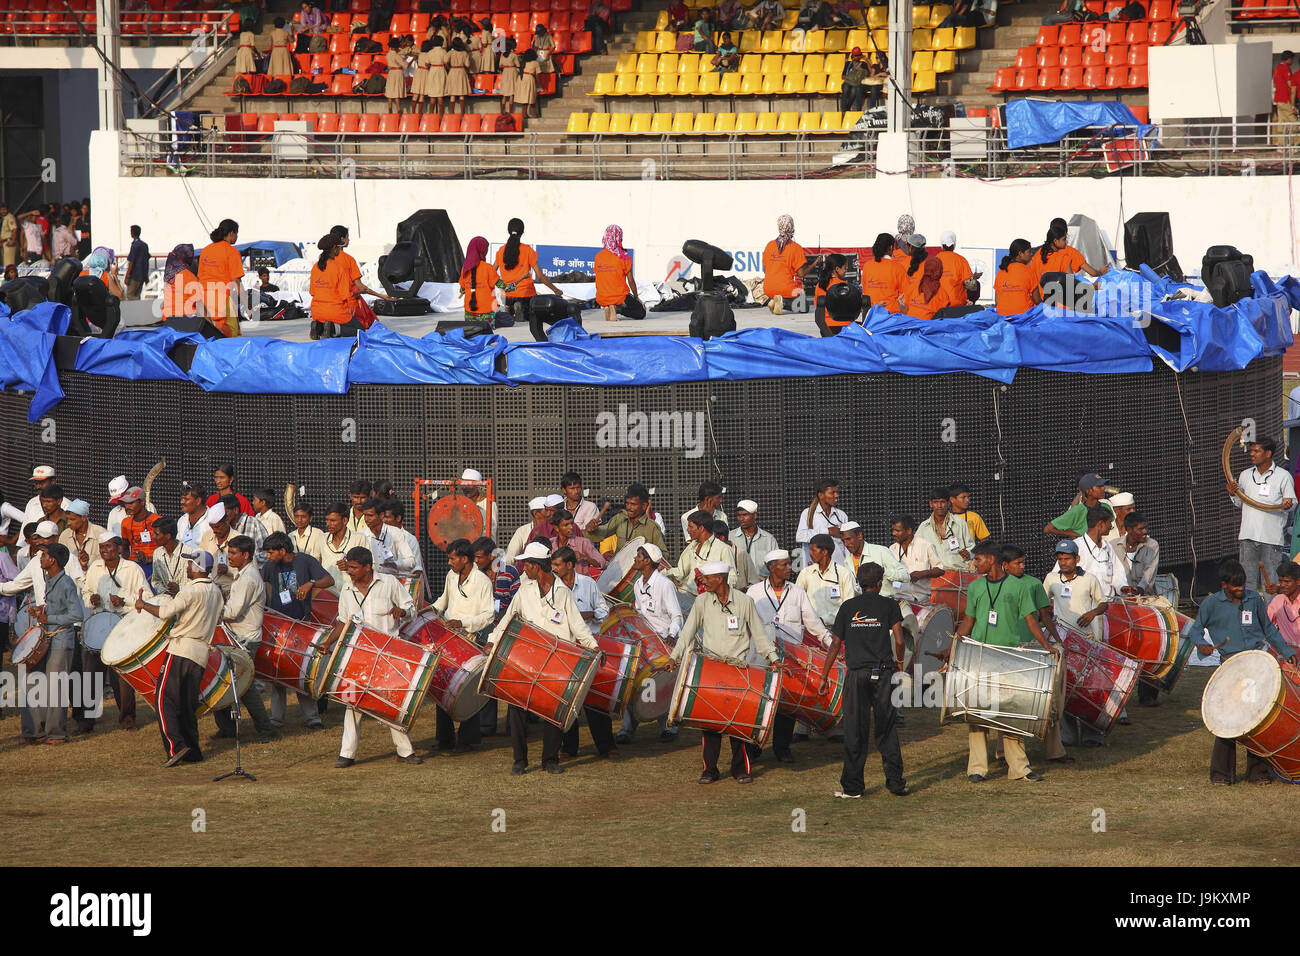 Drummers rehearse inauguration ceremony, pune, maharashtra, India, Asia Stock Photo